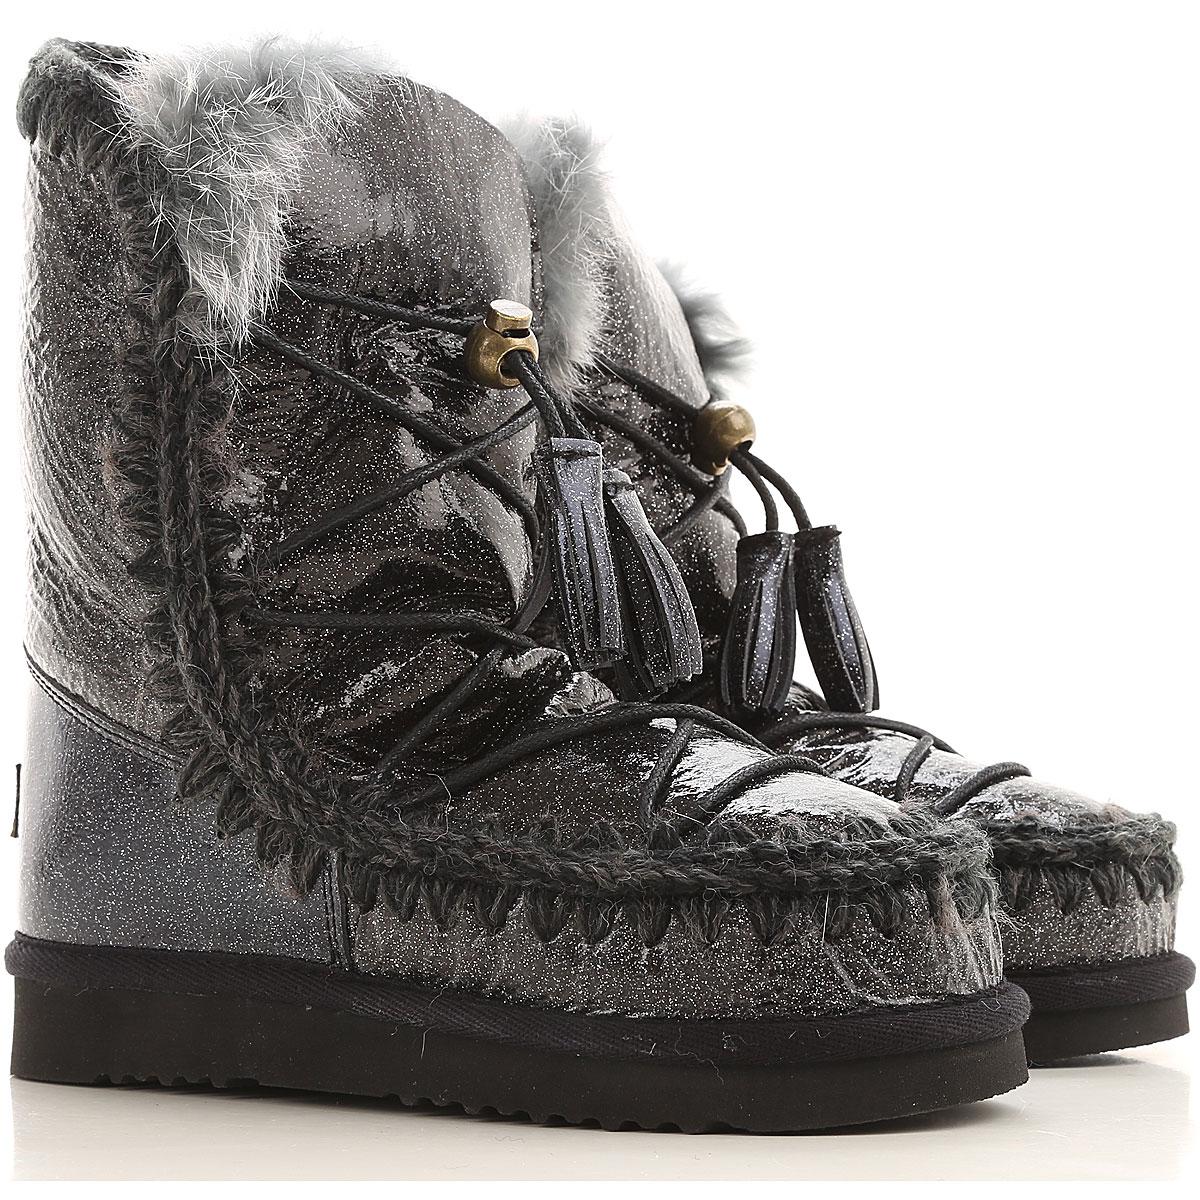 Mou Boots for Women, Booties On Sale in Outlet, Gunmetal, sheepskin, 2019, EUR 37 - UK 4 - USA 6.5 EUR 38 - UK 5 - USA 7.5 EUR 40 - UK 7 - USA 9.5